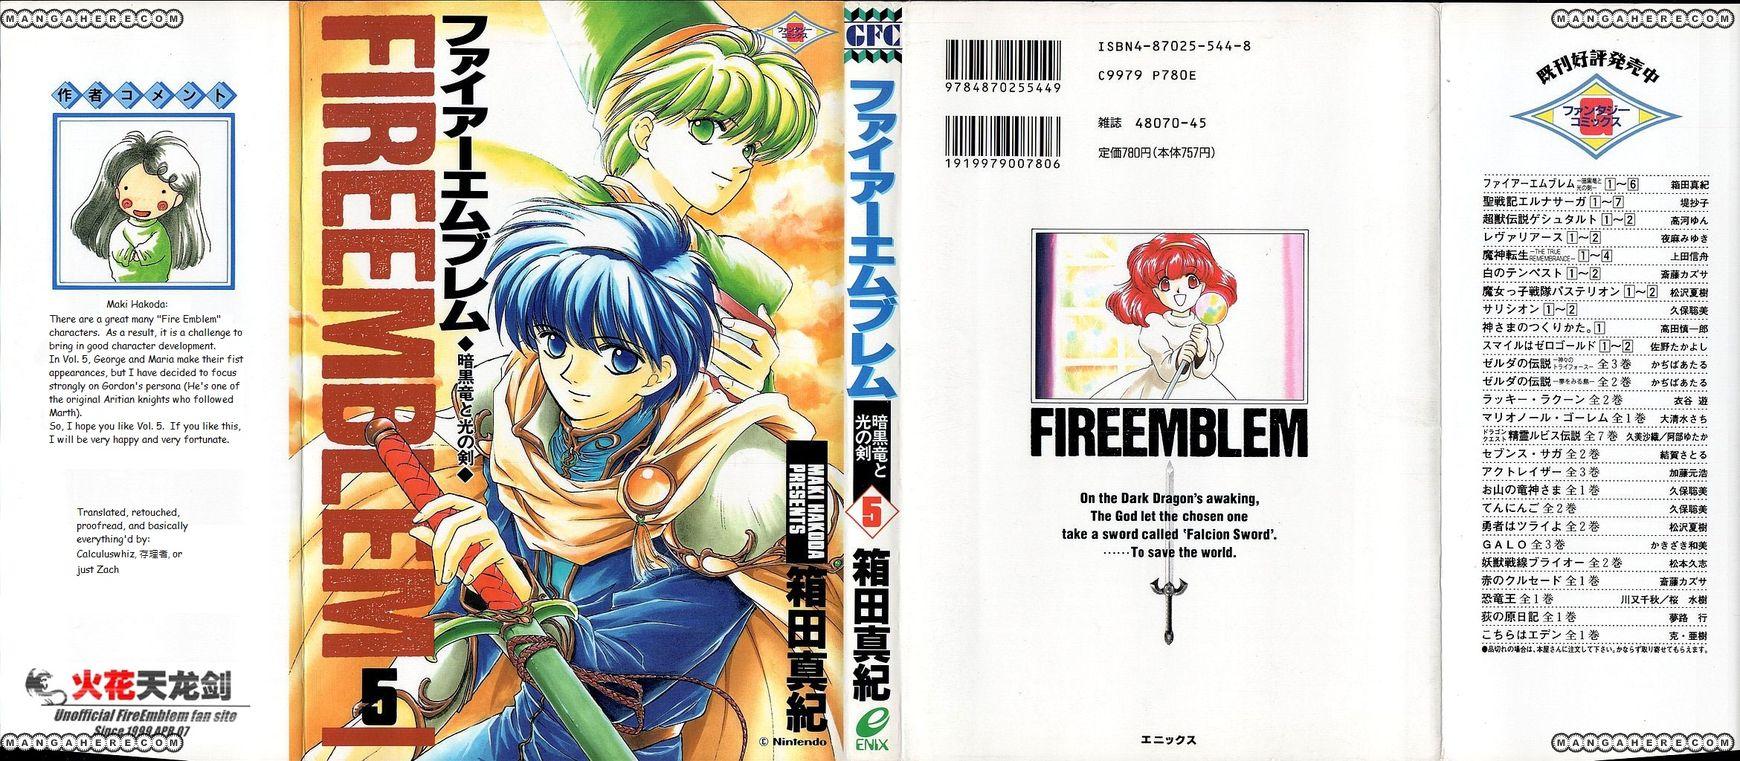 Fire Emblem: Ankokuryuu to Hikari no Ken 21 Page 1